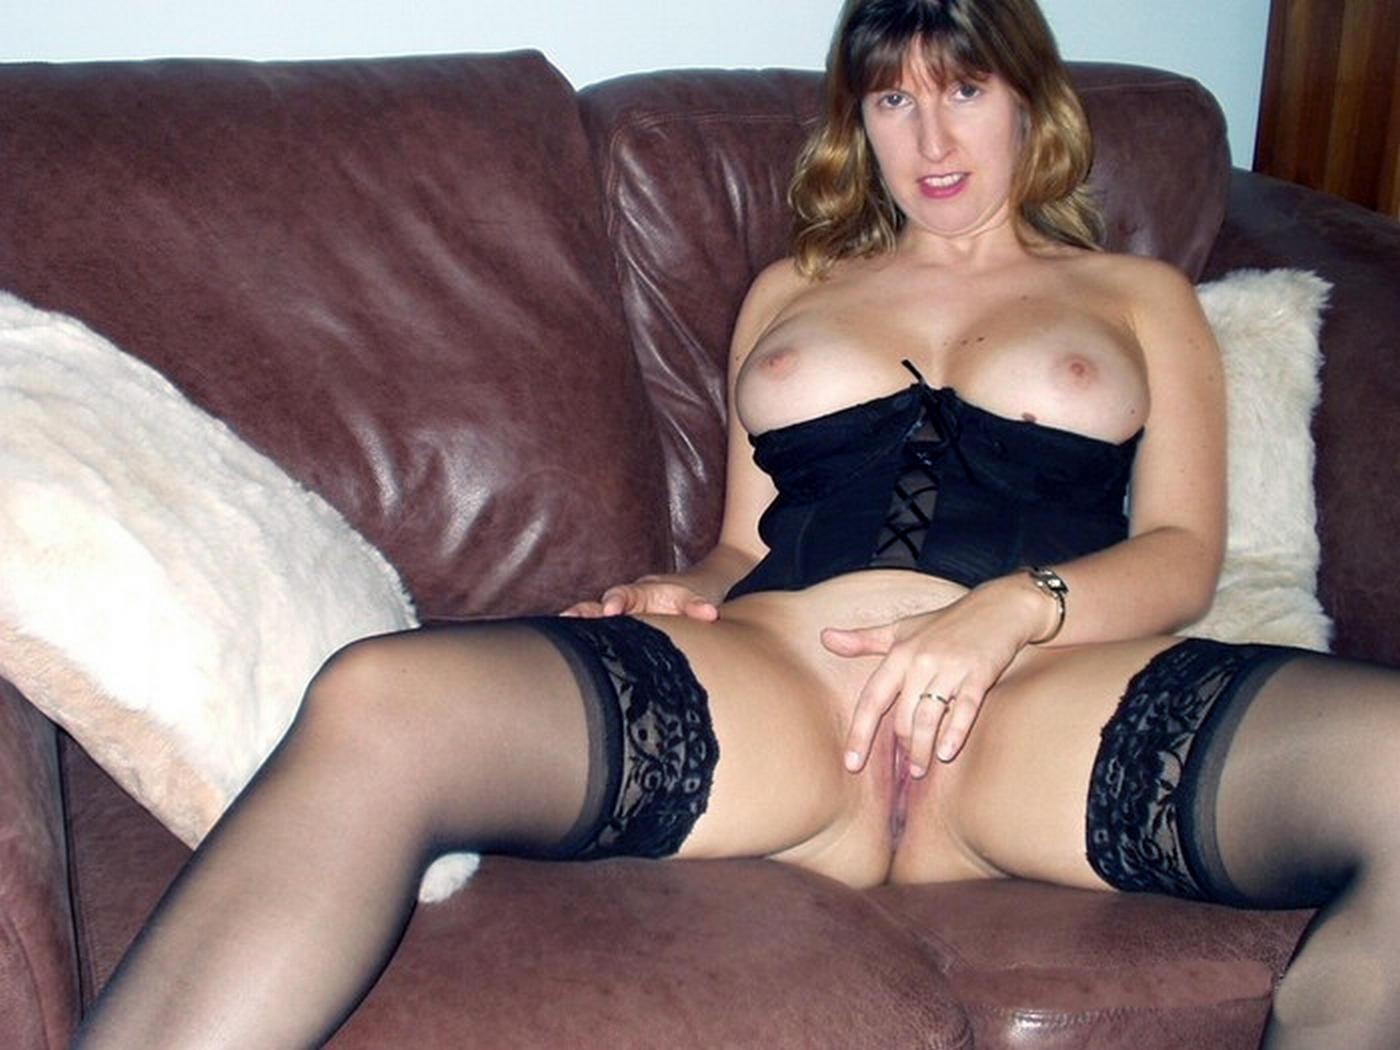 http://pbs-2.adult-empire.com/85/8570/014/pic/9.jpg